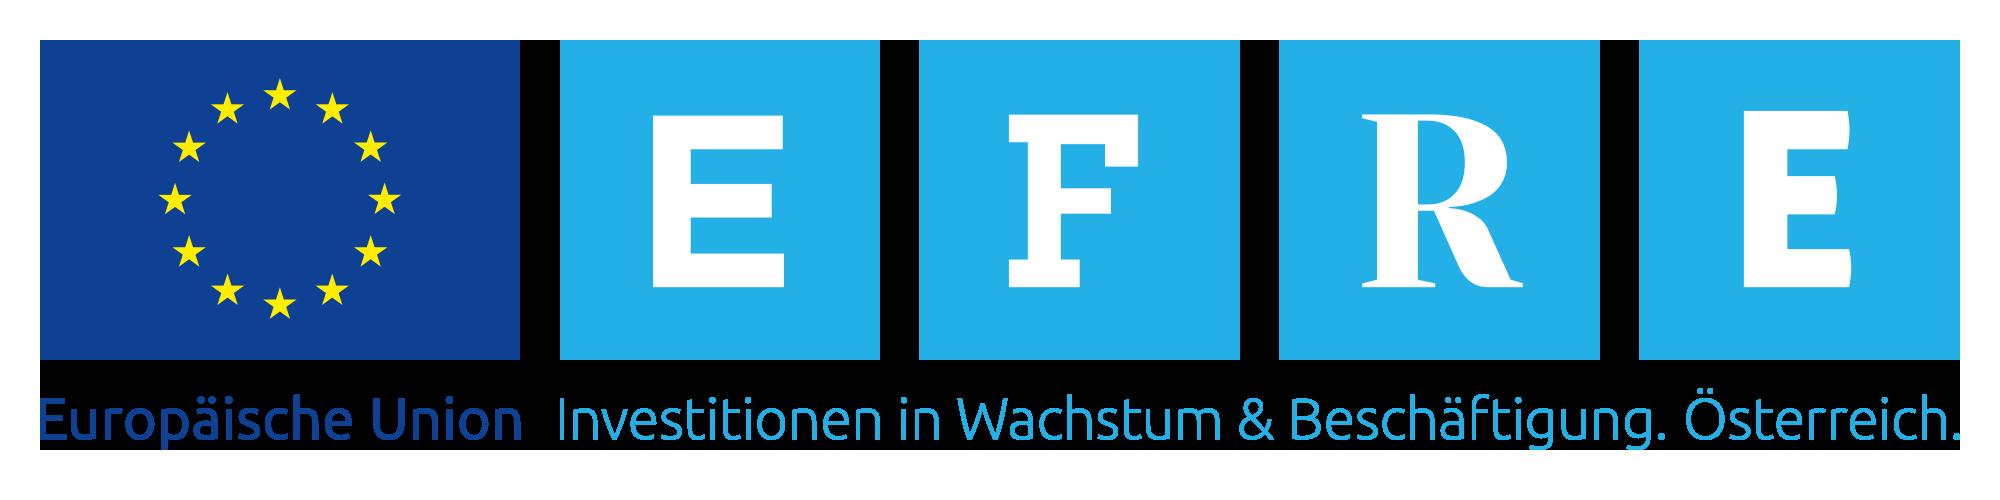 EFRE2014-4c-Logo2000px_freigestellt